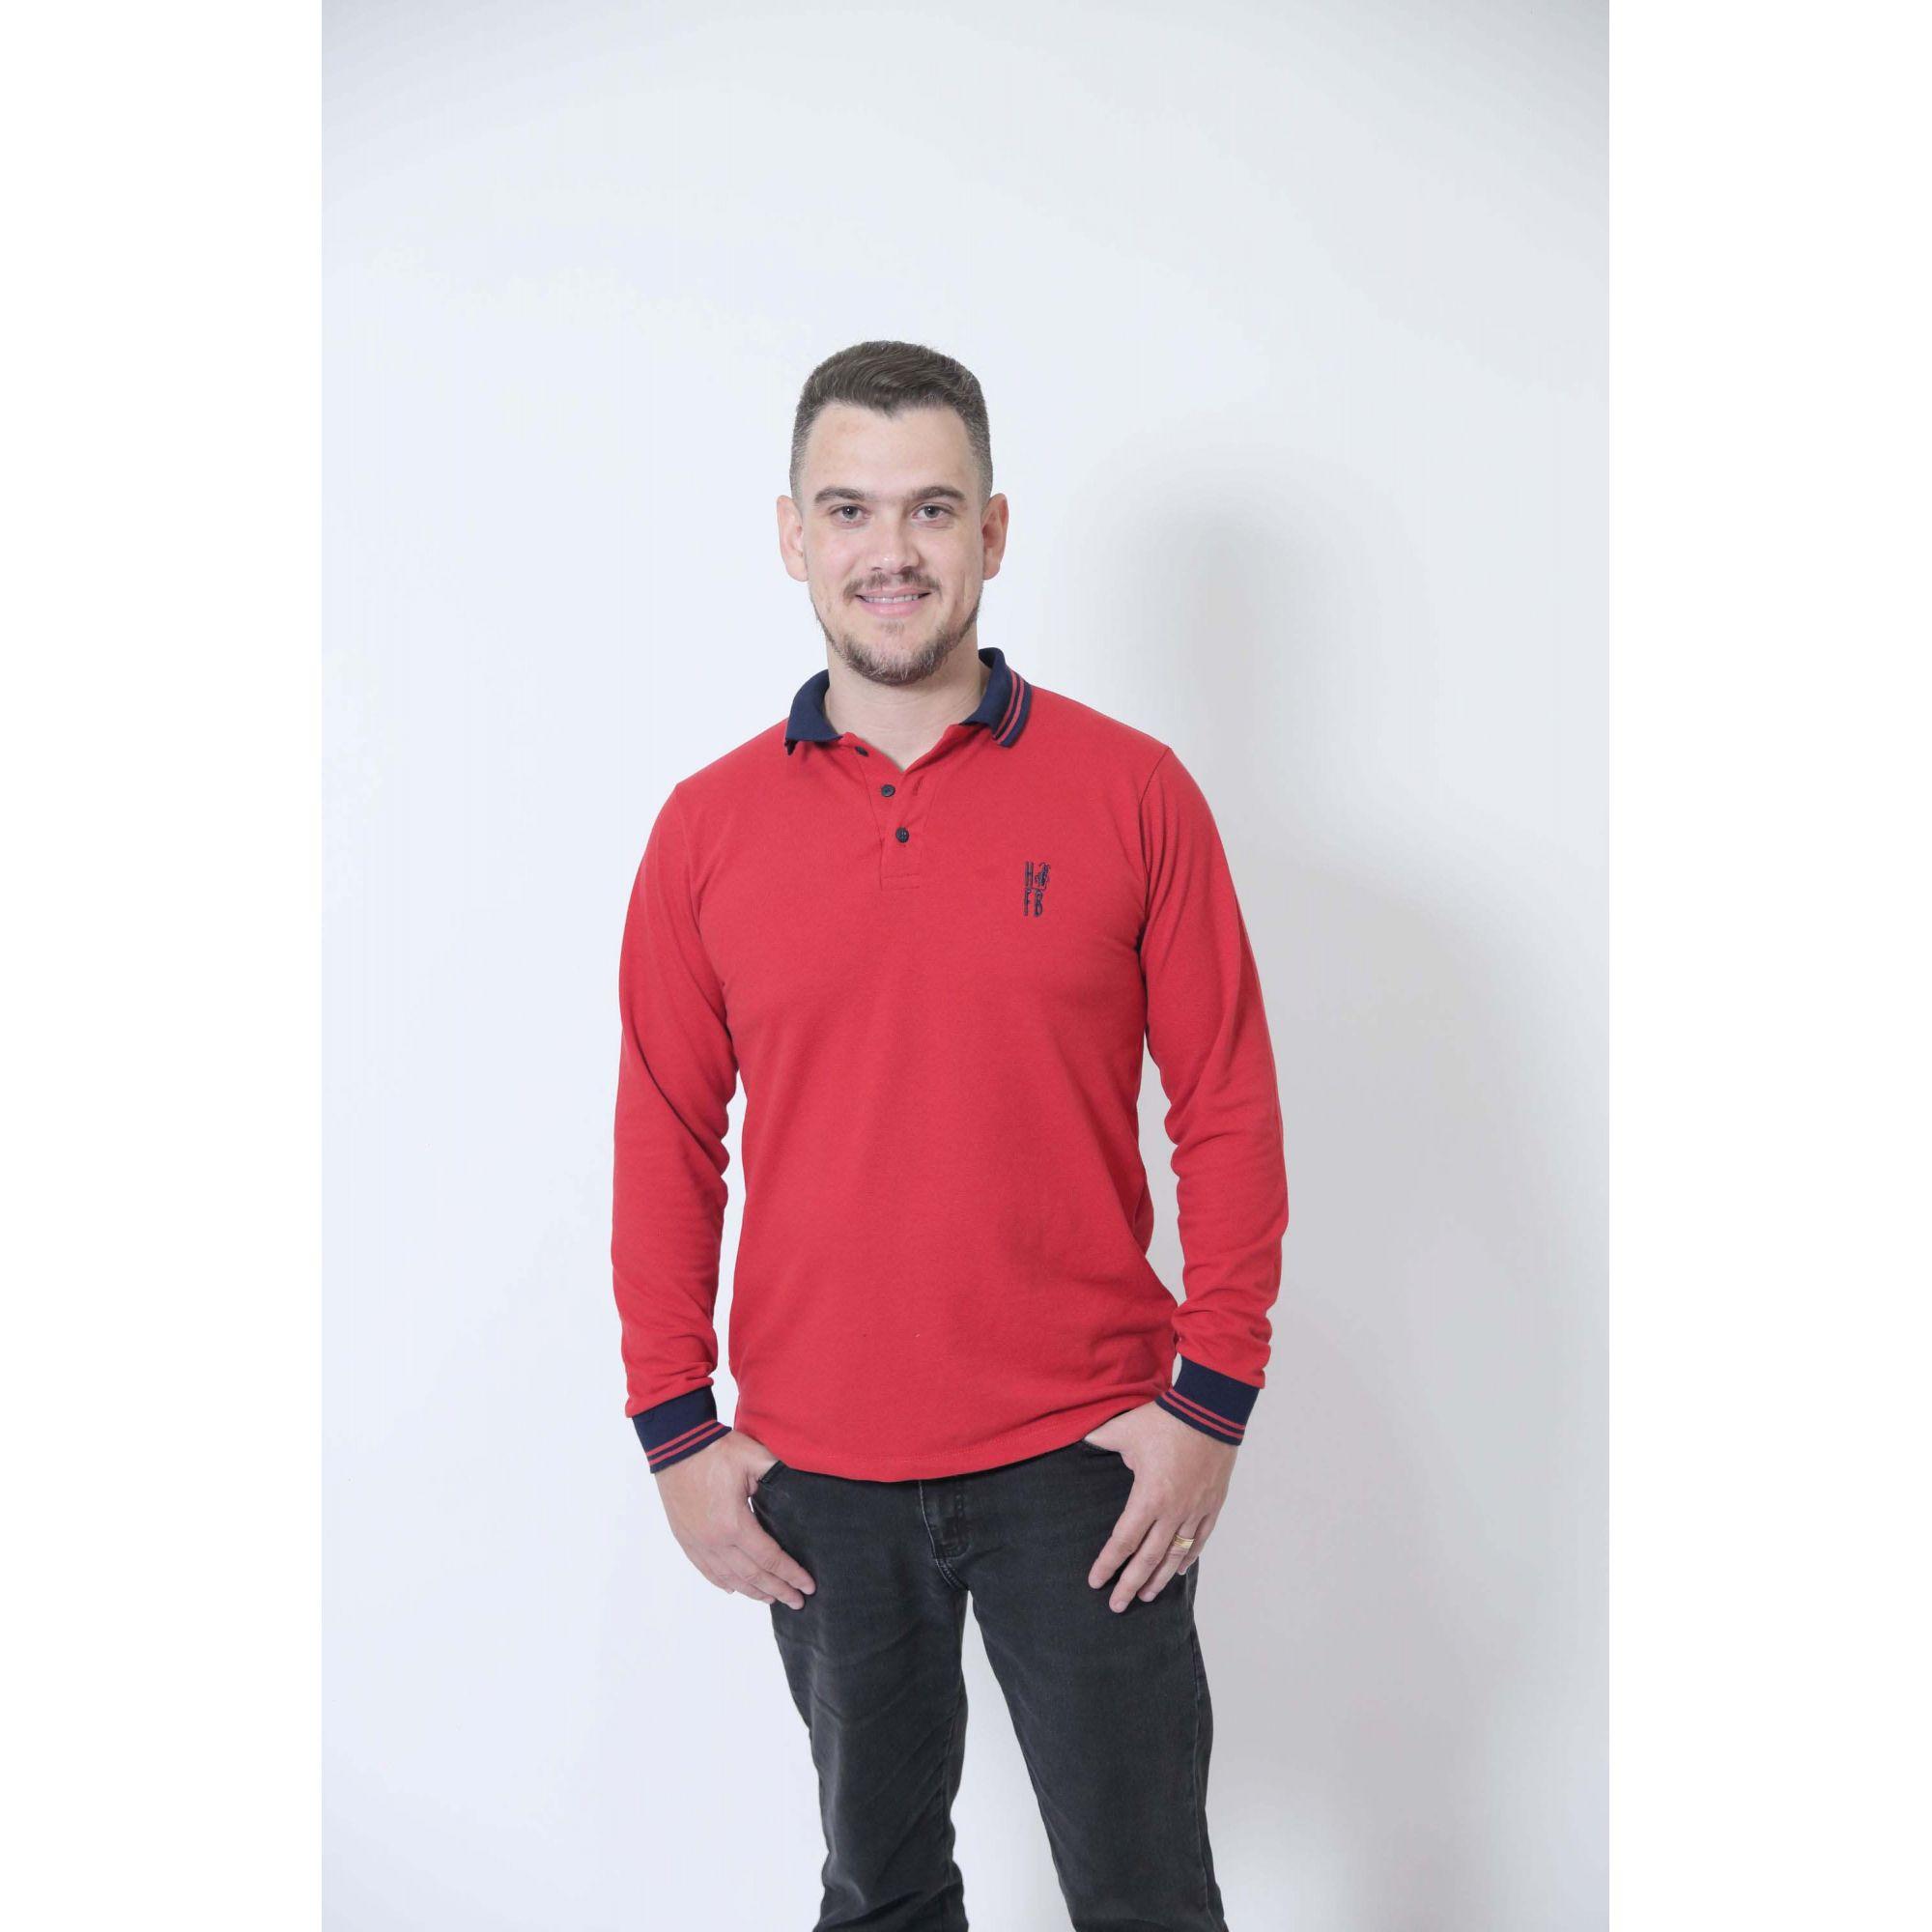 Camisa Polo Vermelho Manga Longa  - Heitor Fashion Brazil